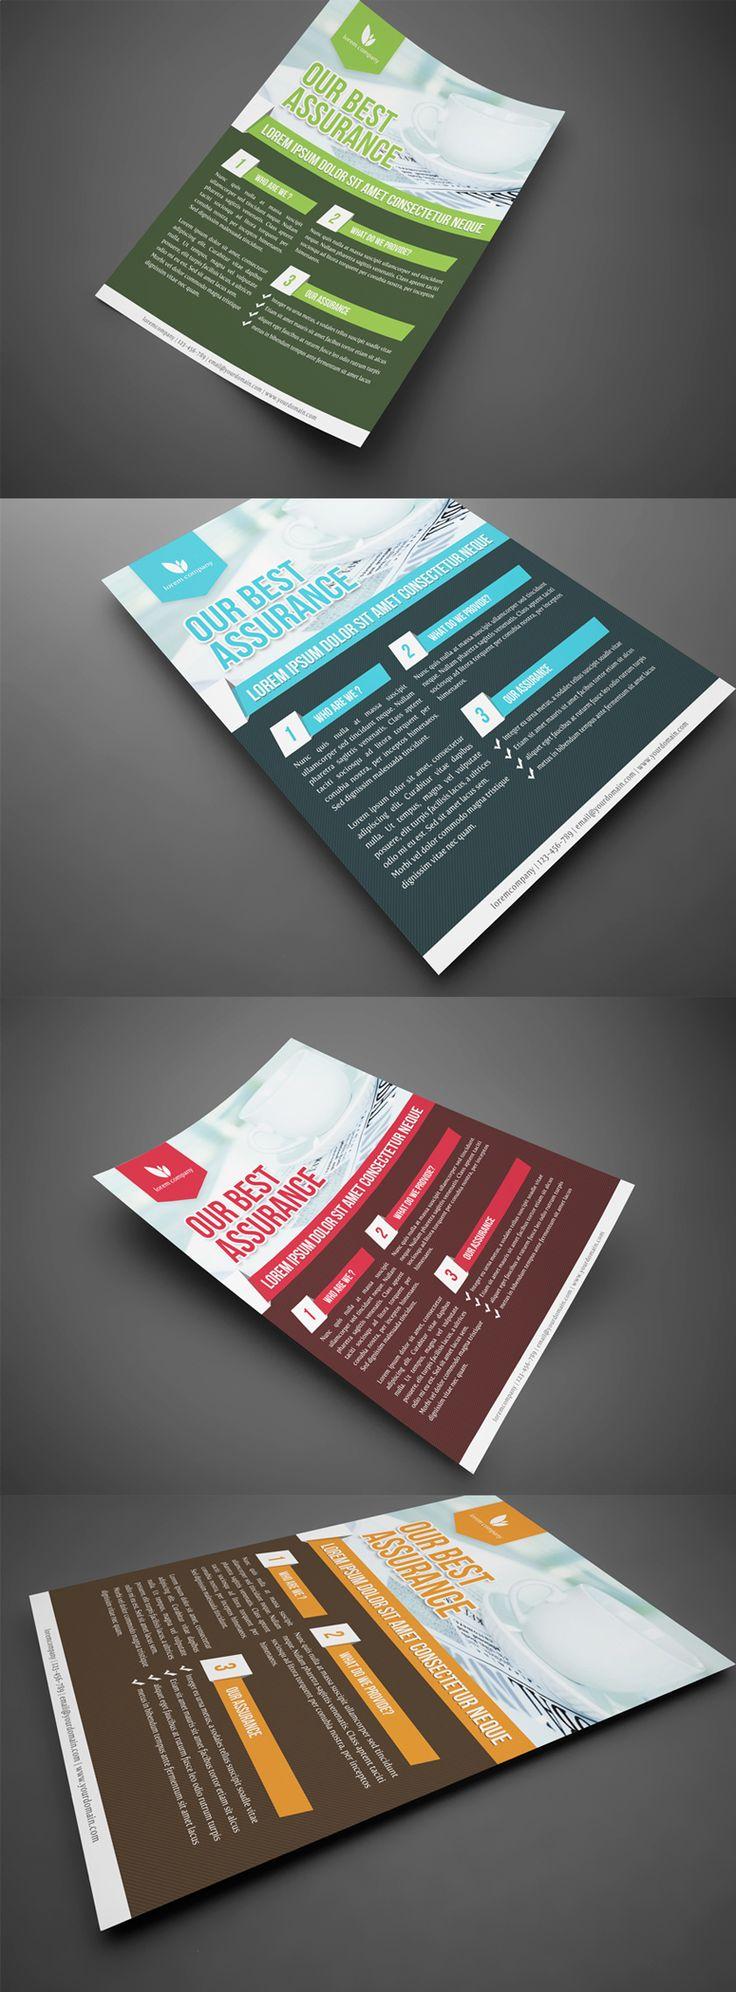 6 poster design photo mockups 57079 - Flyer Design Inspiration Simple Professional Corporate Flyer